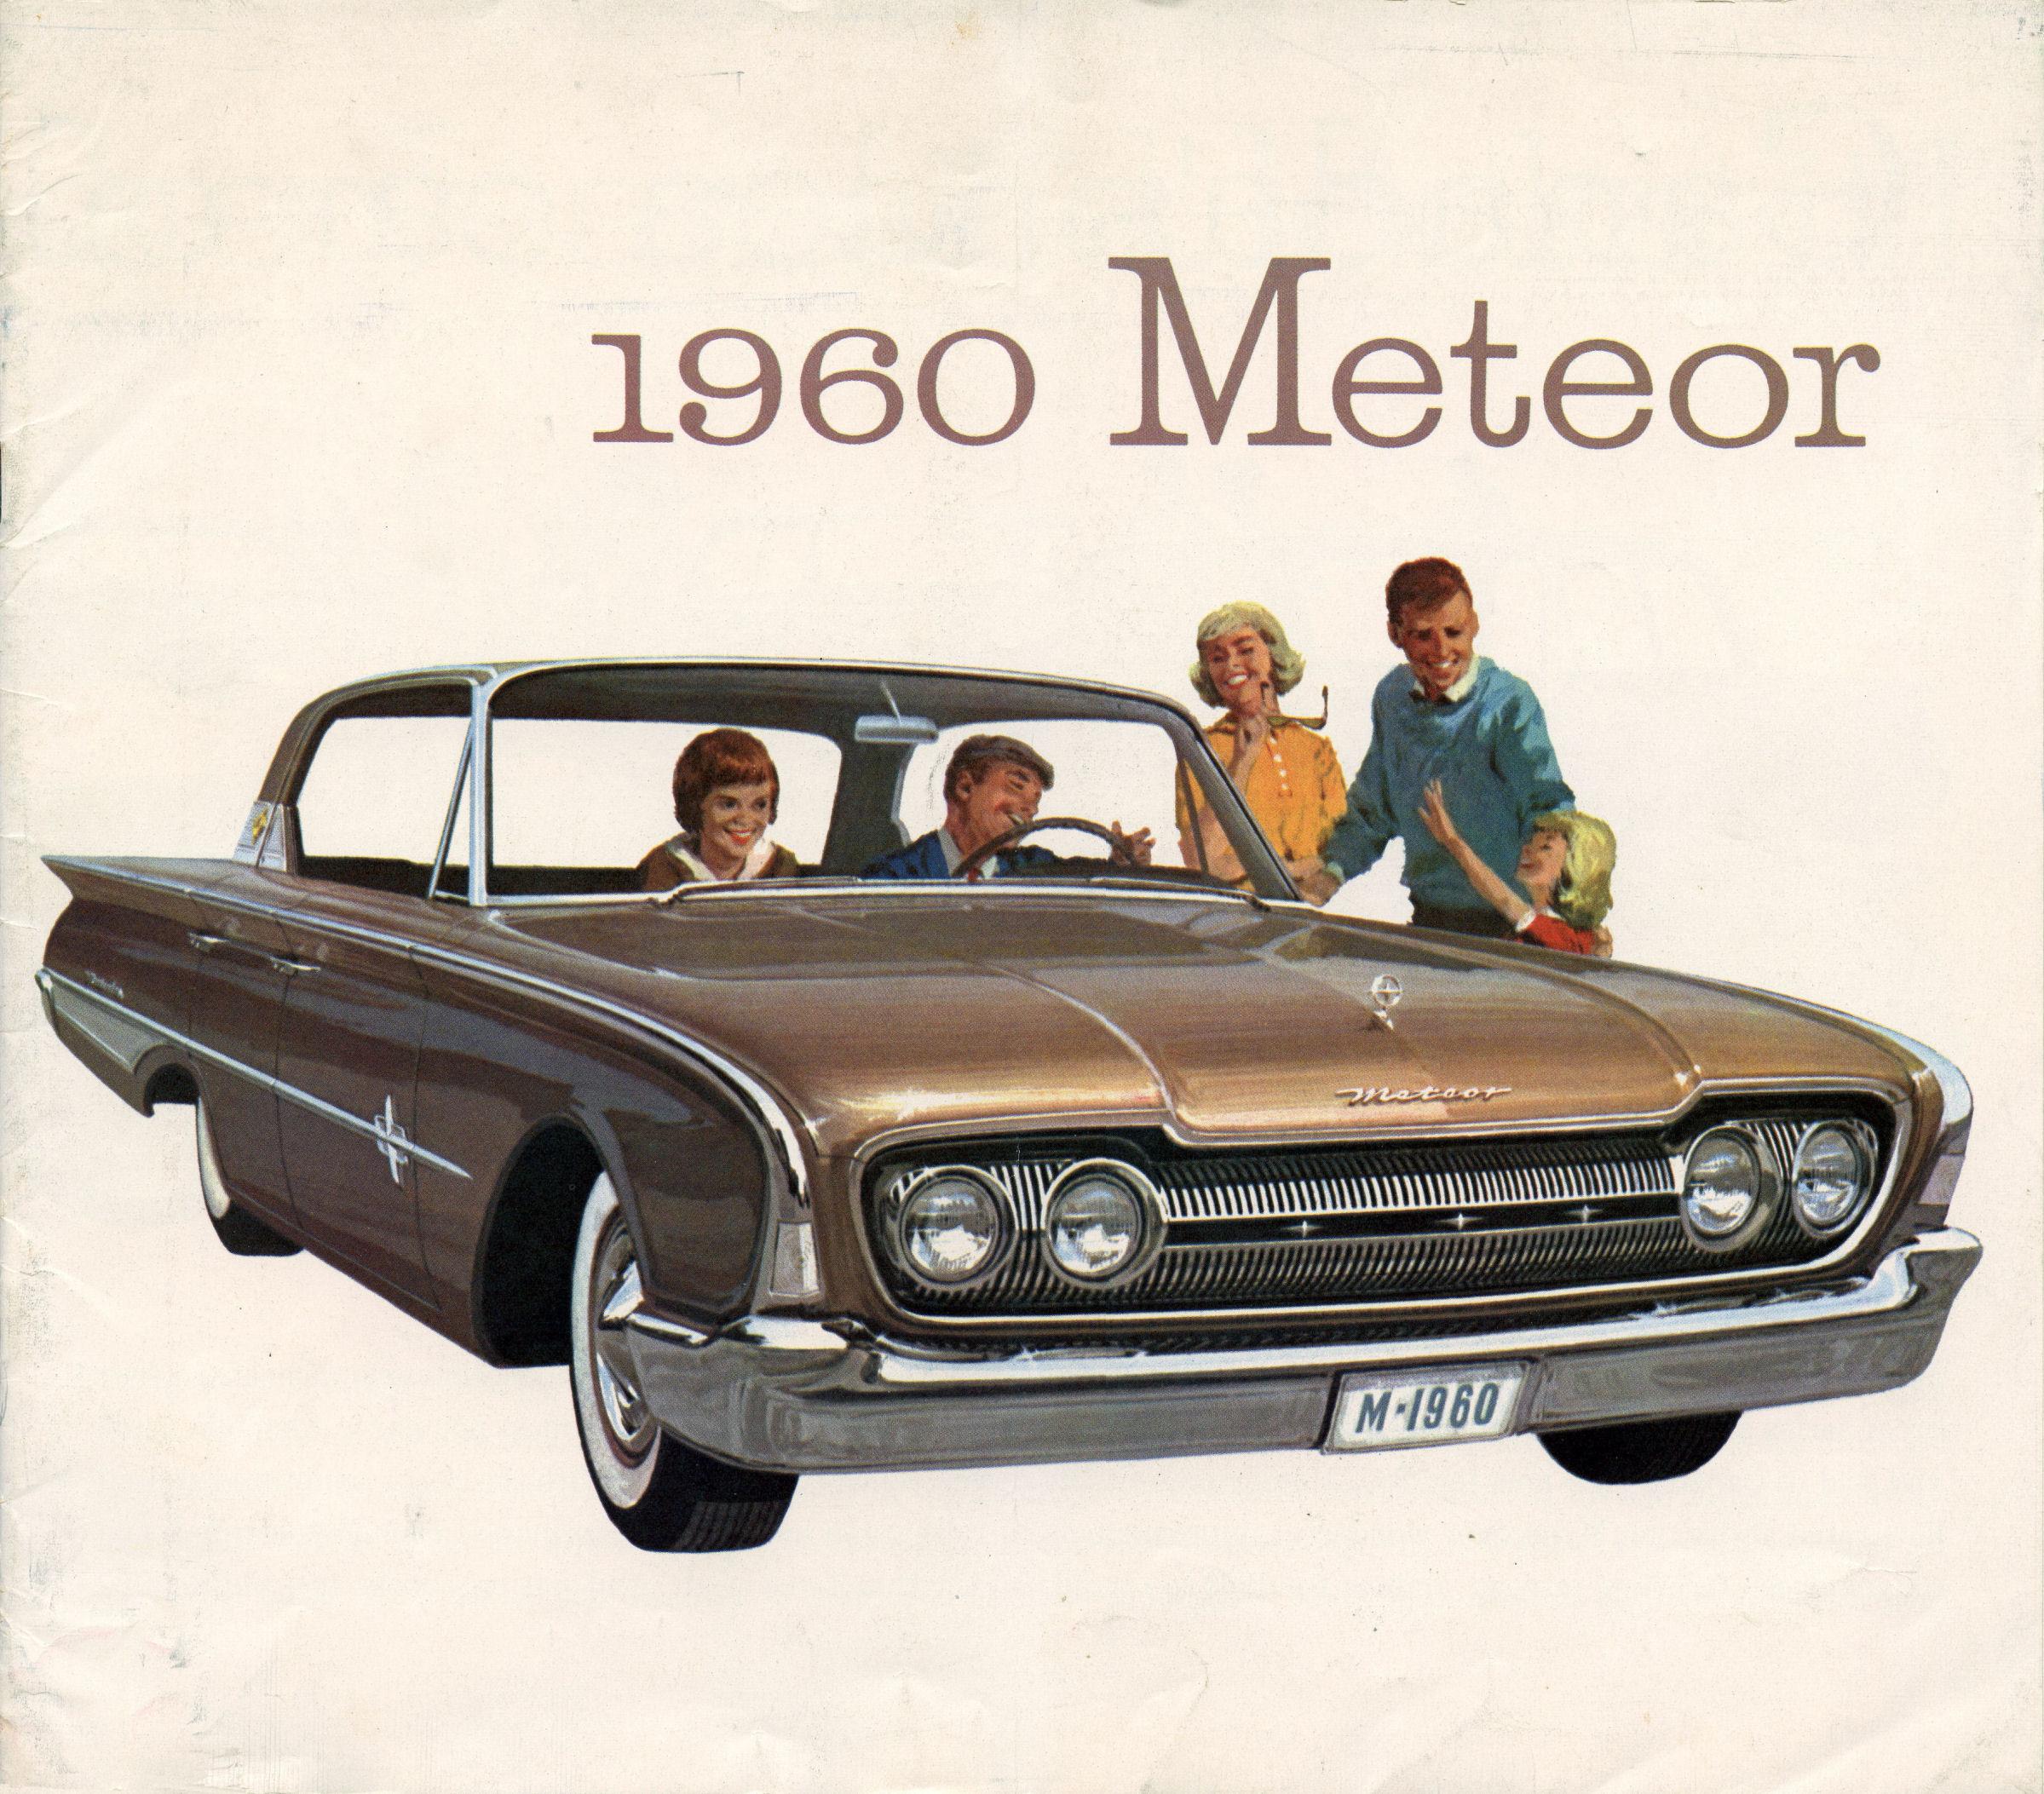 Image: 1960 Meteor Brochure/1960 Meteor-01